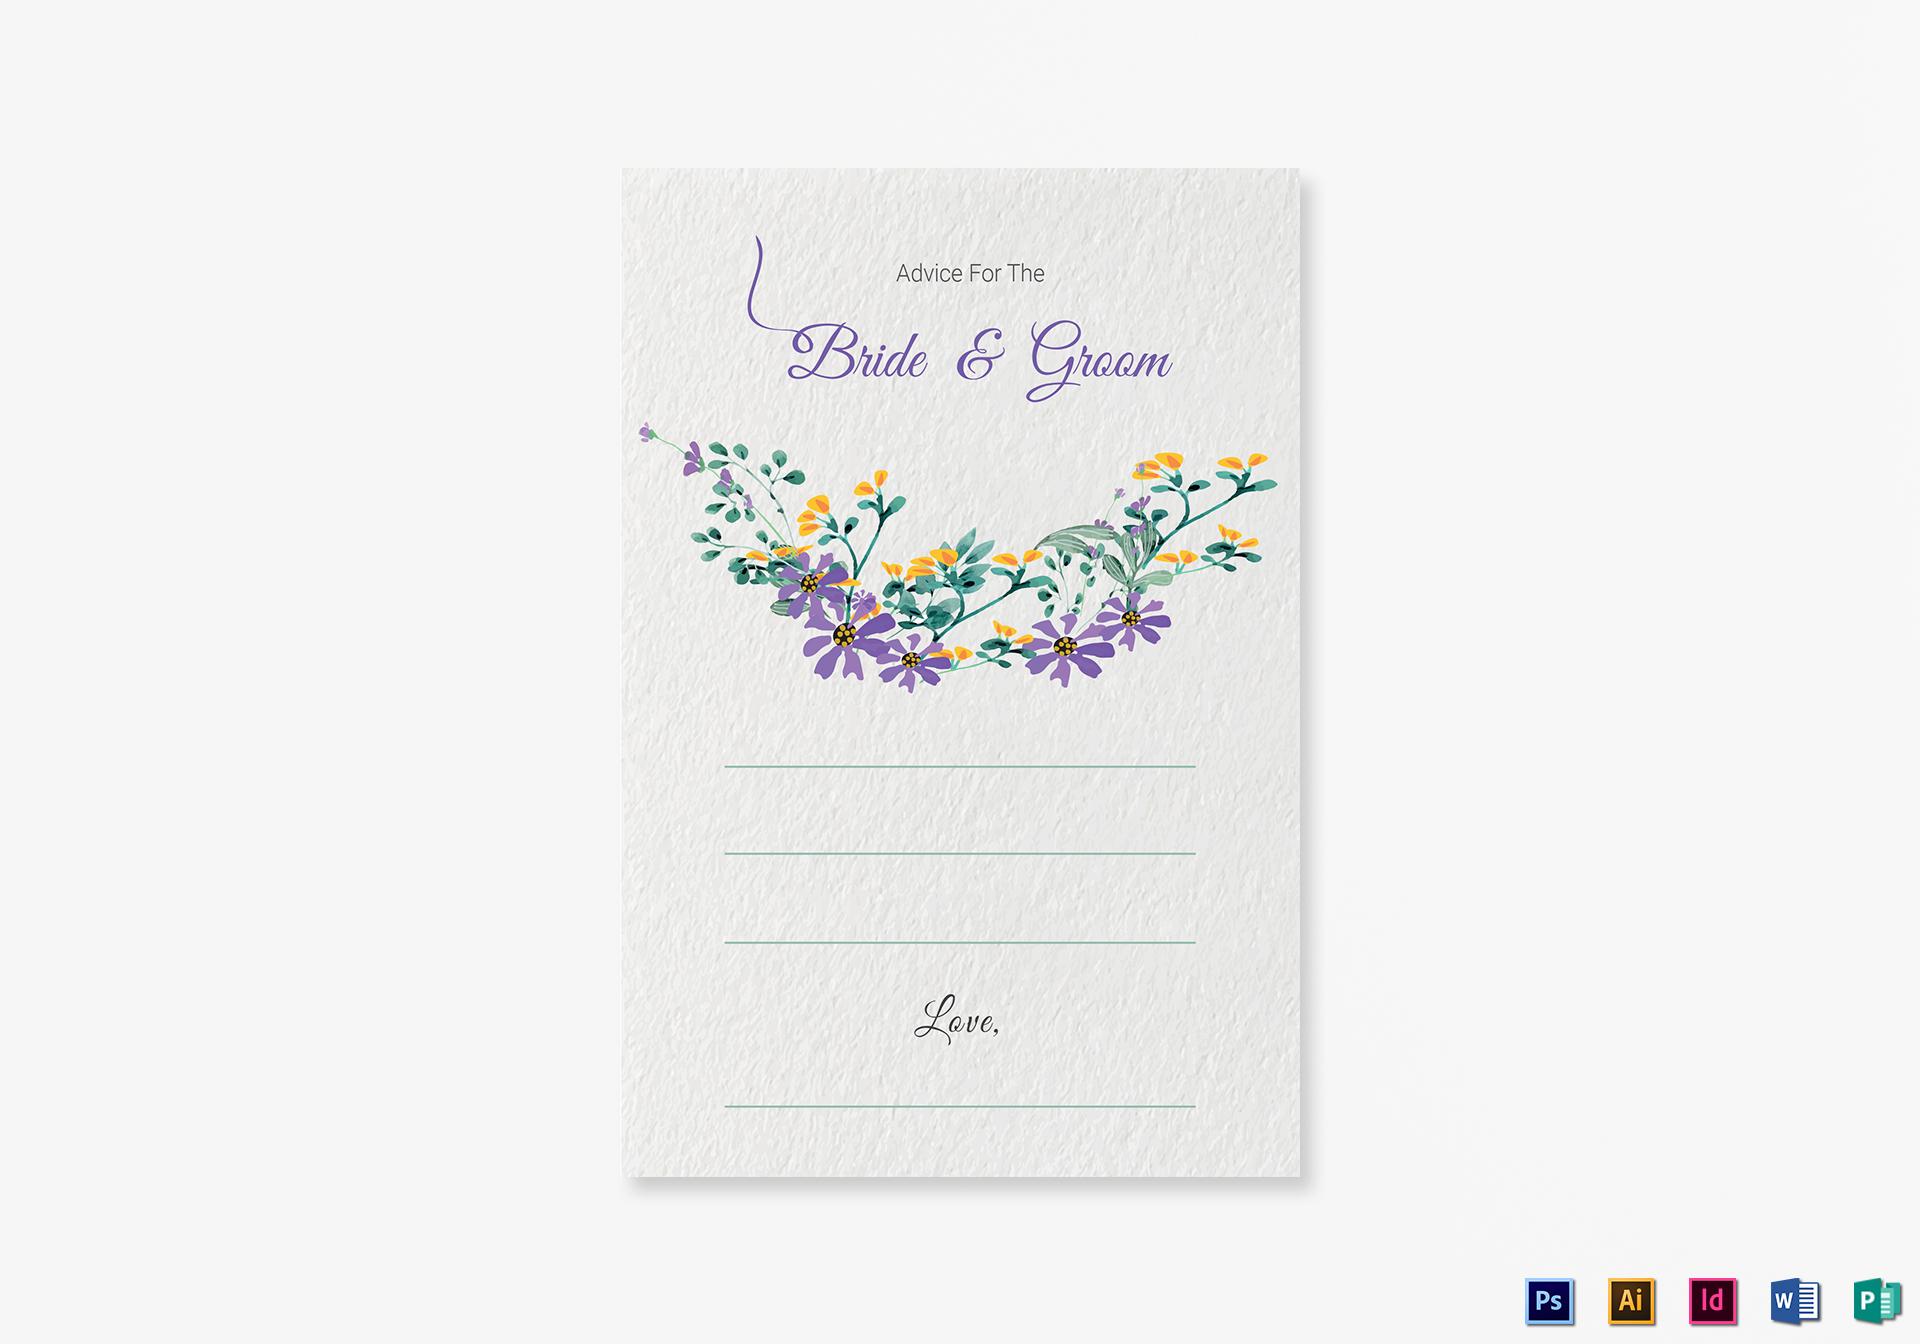 Garden Wedding Advice Card Template In Psd Word Publisher